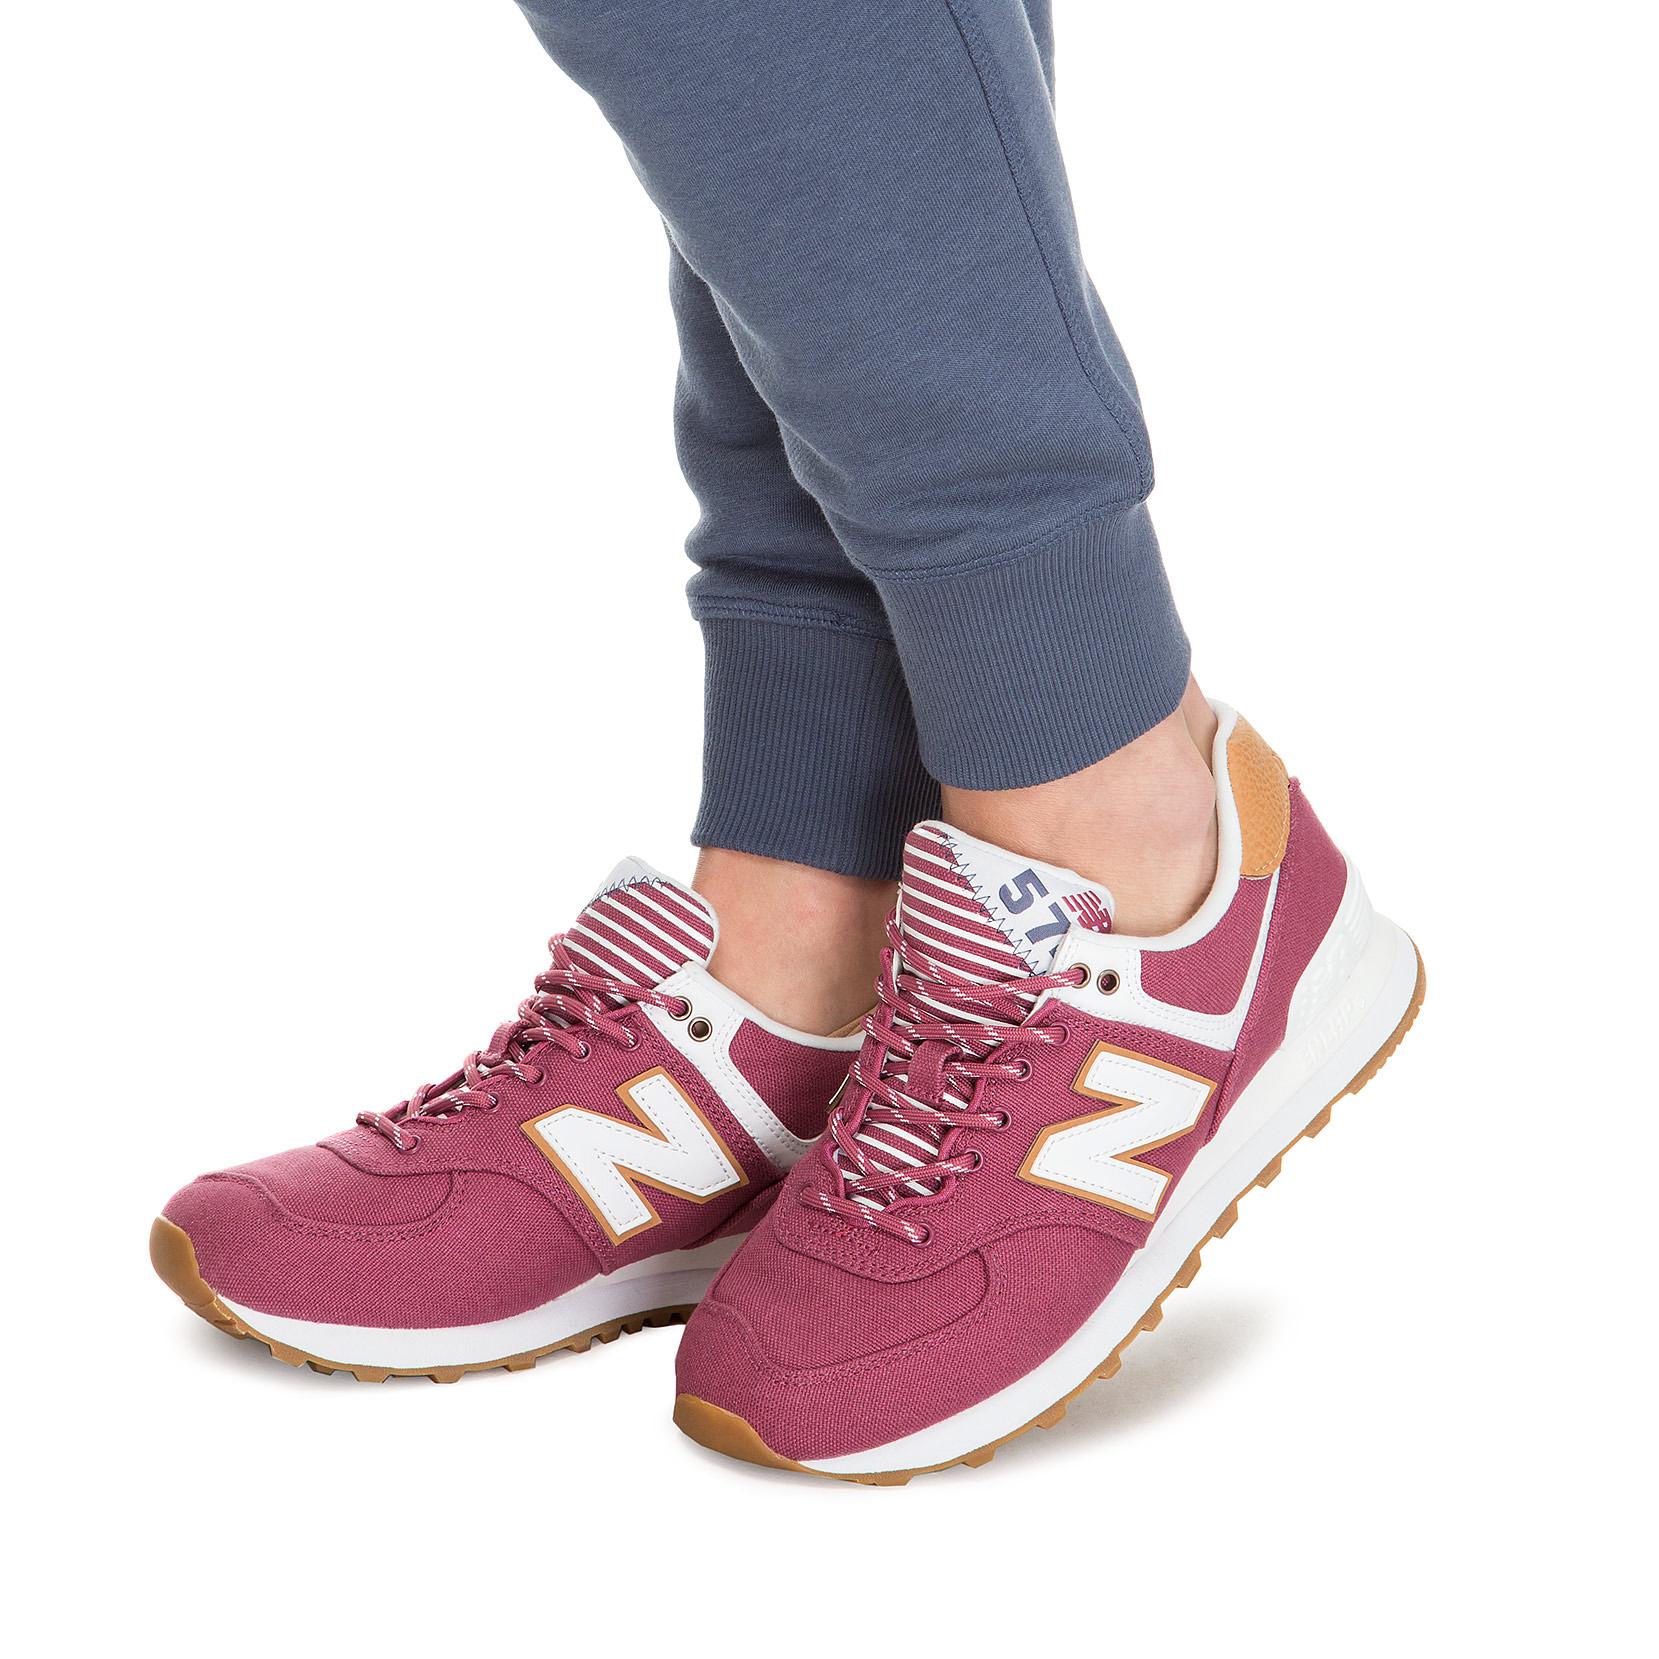 Жіноче взуття повсякденне New Balance 574 Sea Escape WL574SYF | New Balance